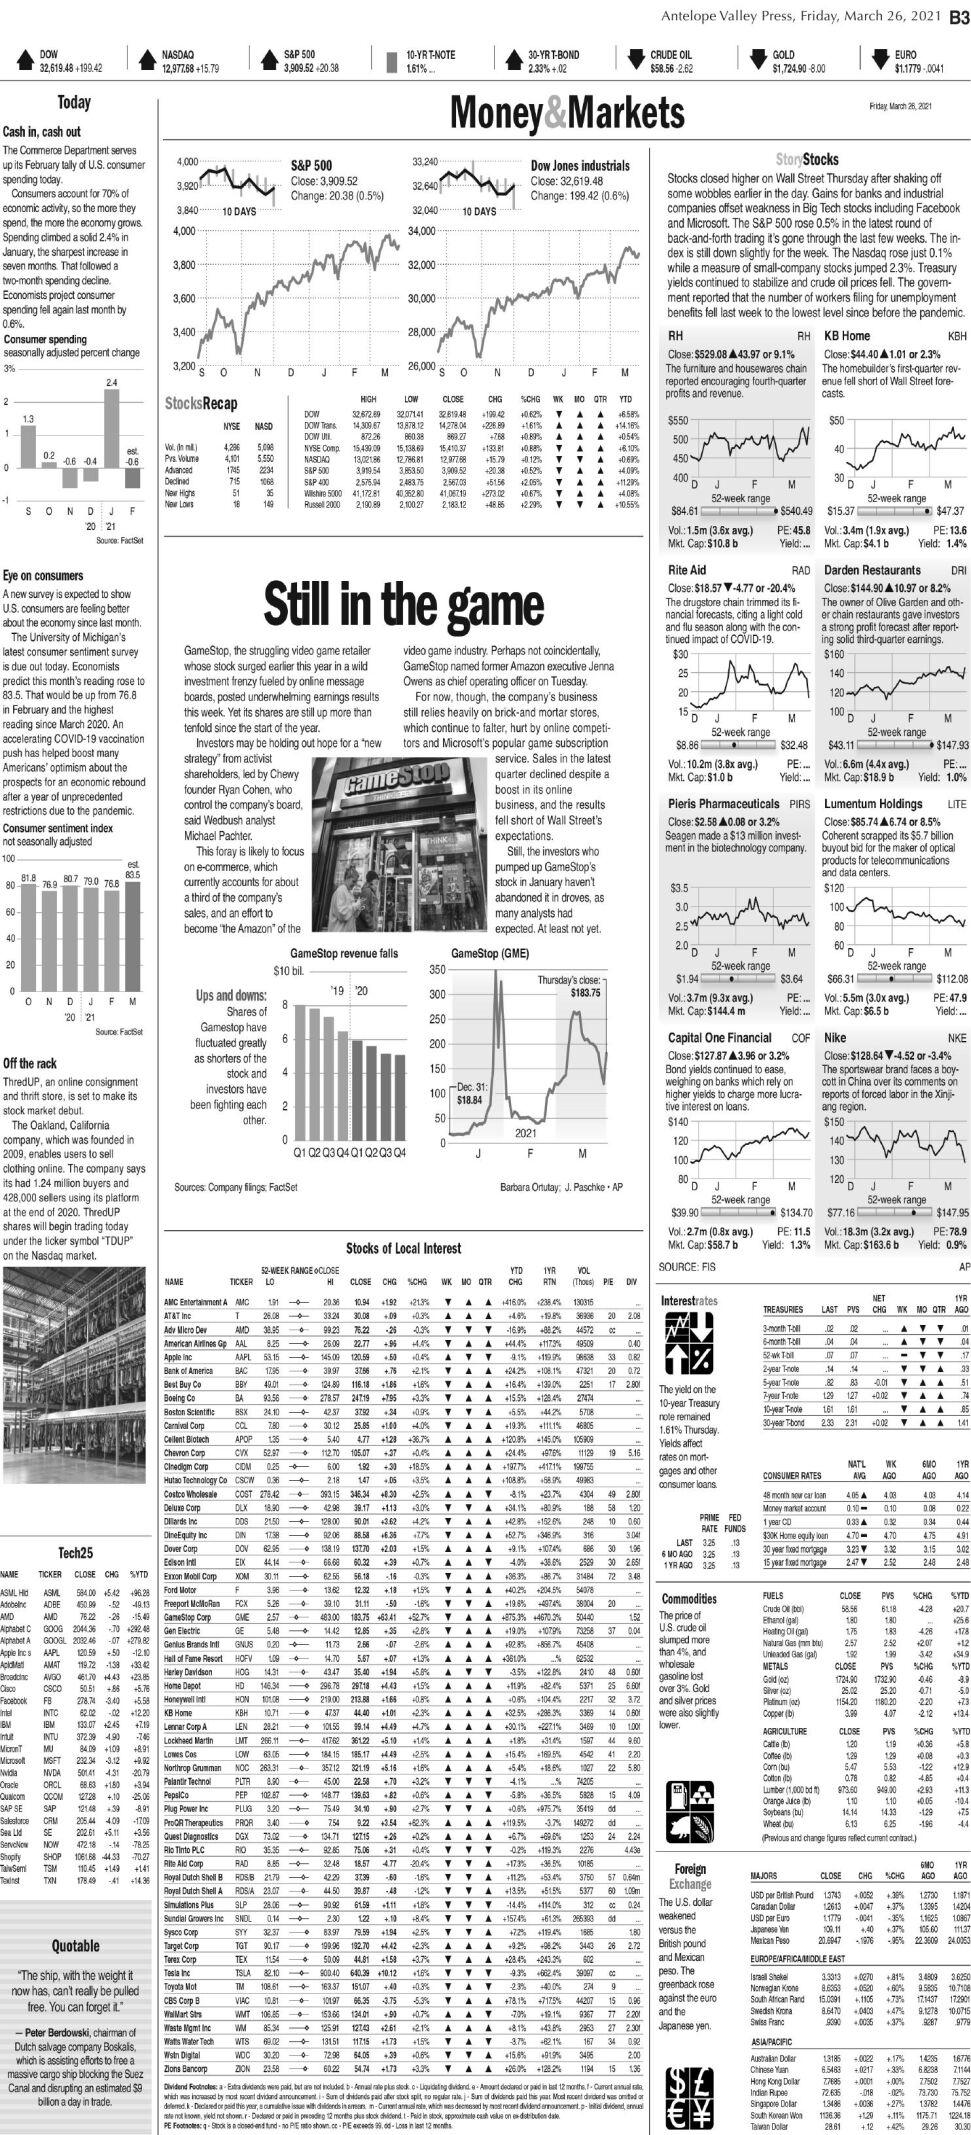 Money & Markets, March 26, 2021